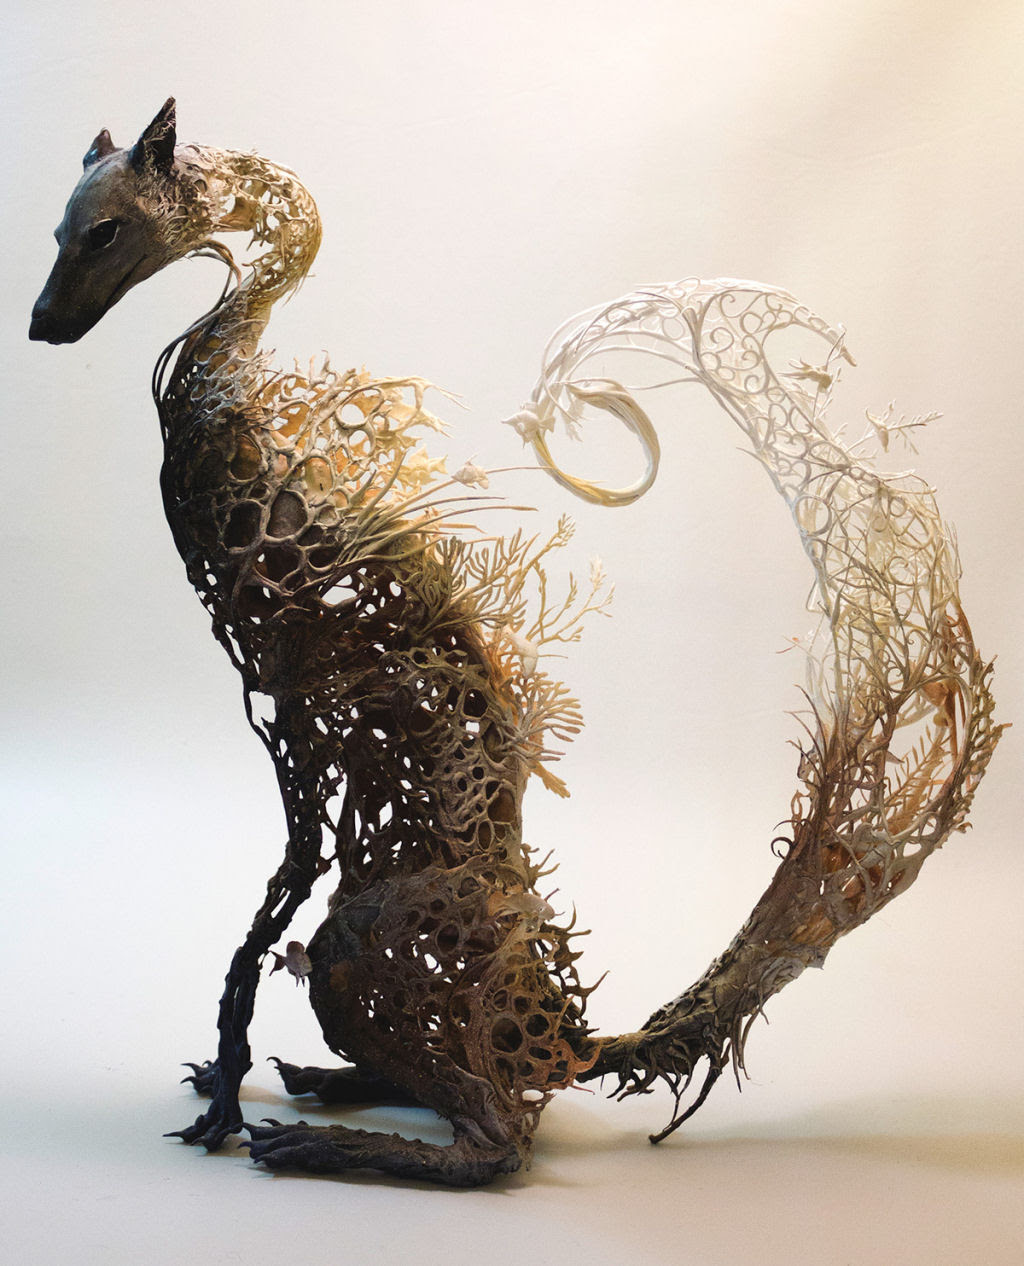 As esculturas surrealistas de Ellen Jewett mesclam plantas e vida animal 02